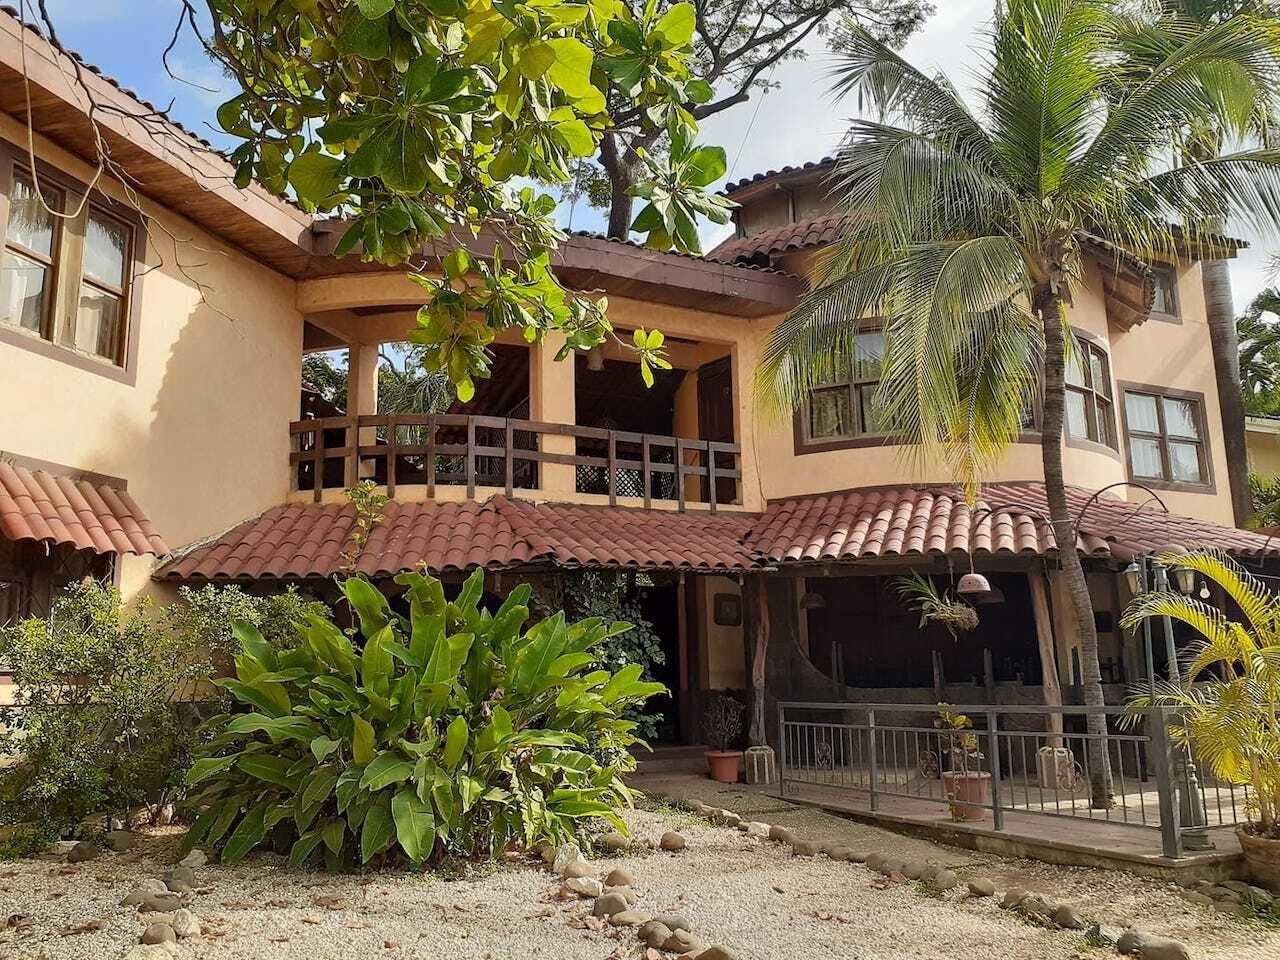 beach-town-for-solo-travelers-hotel-boruca-tamarindo,  beach town for solo travelers